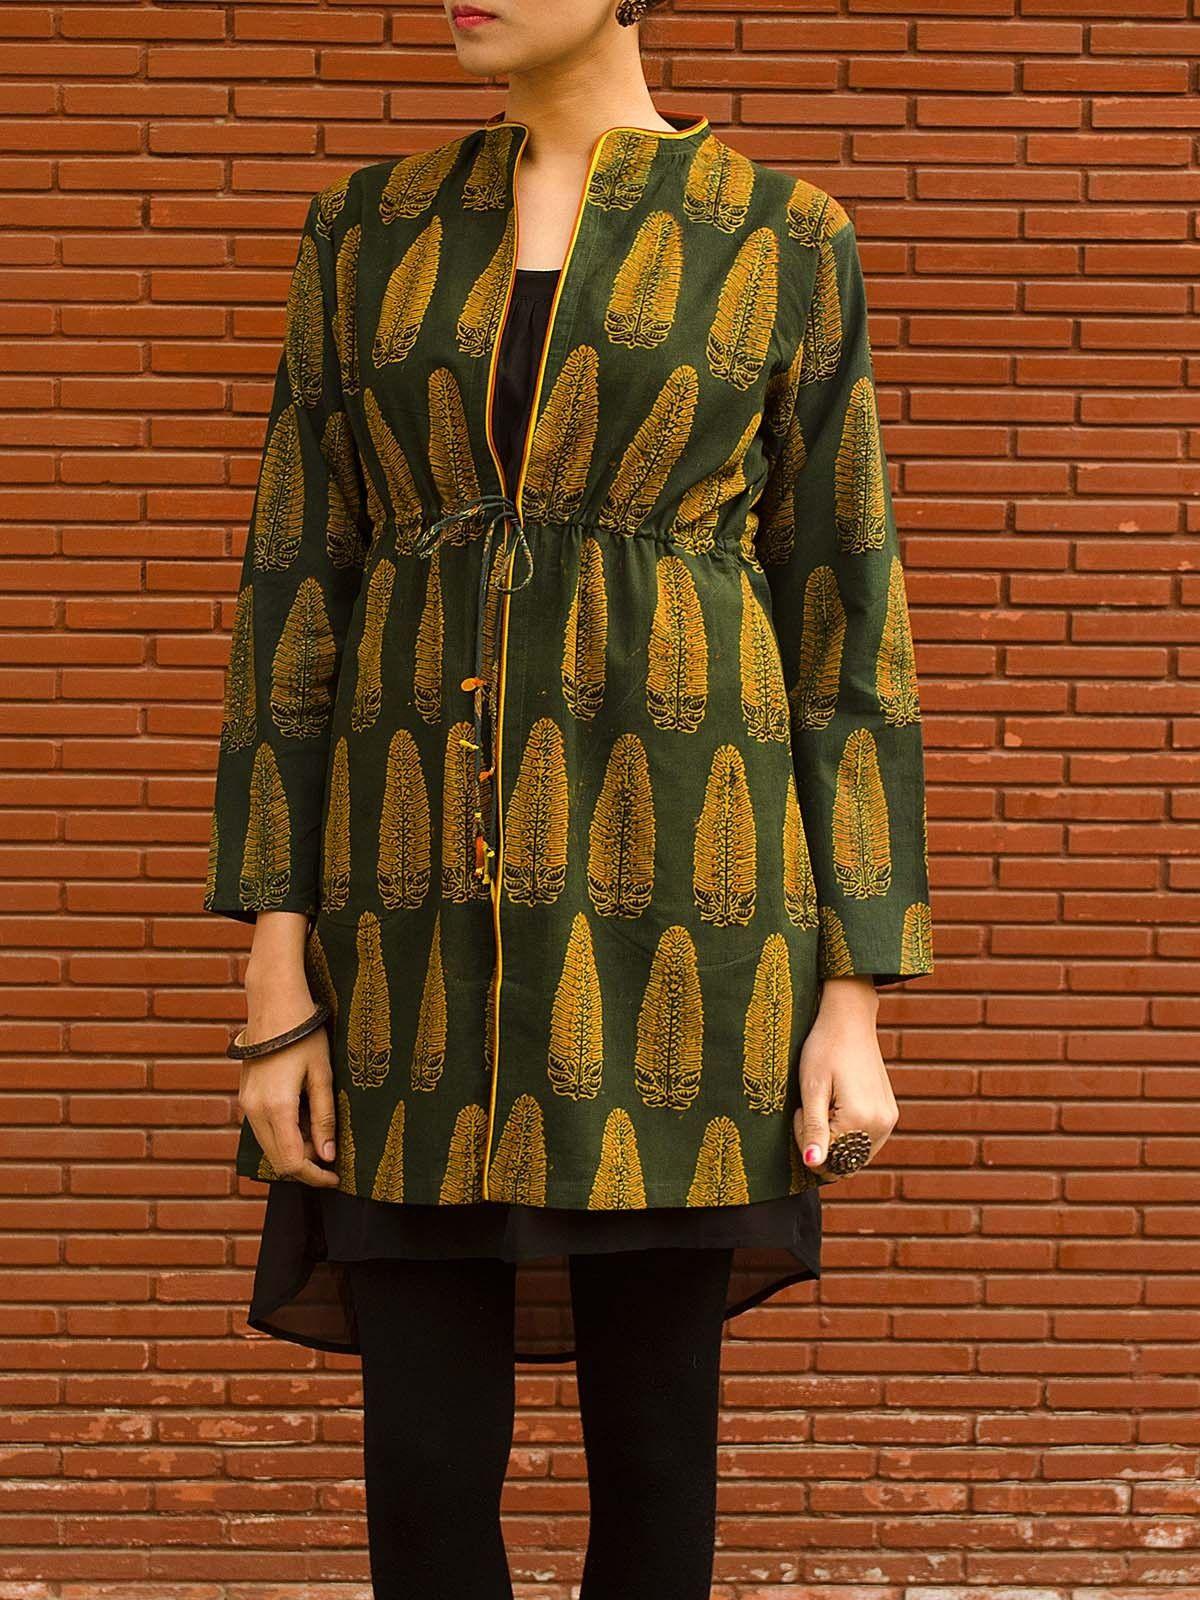 Jacket in Ajrak Cotton Print